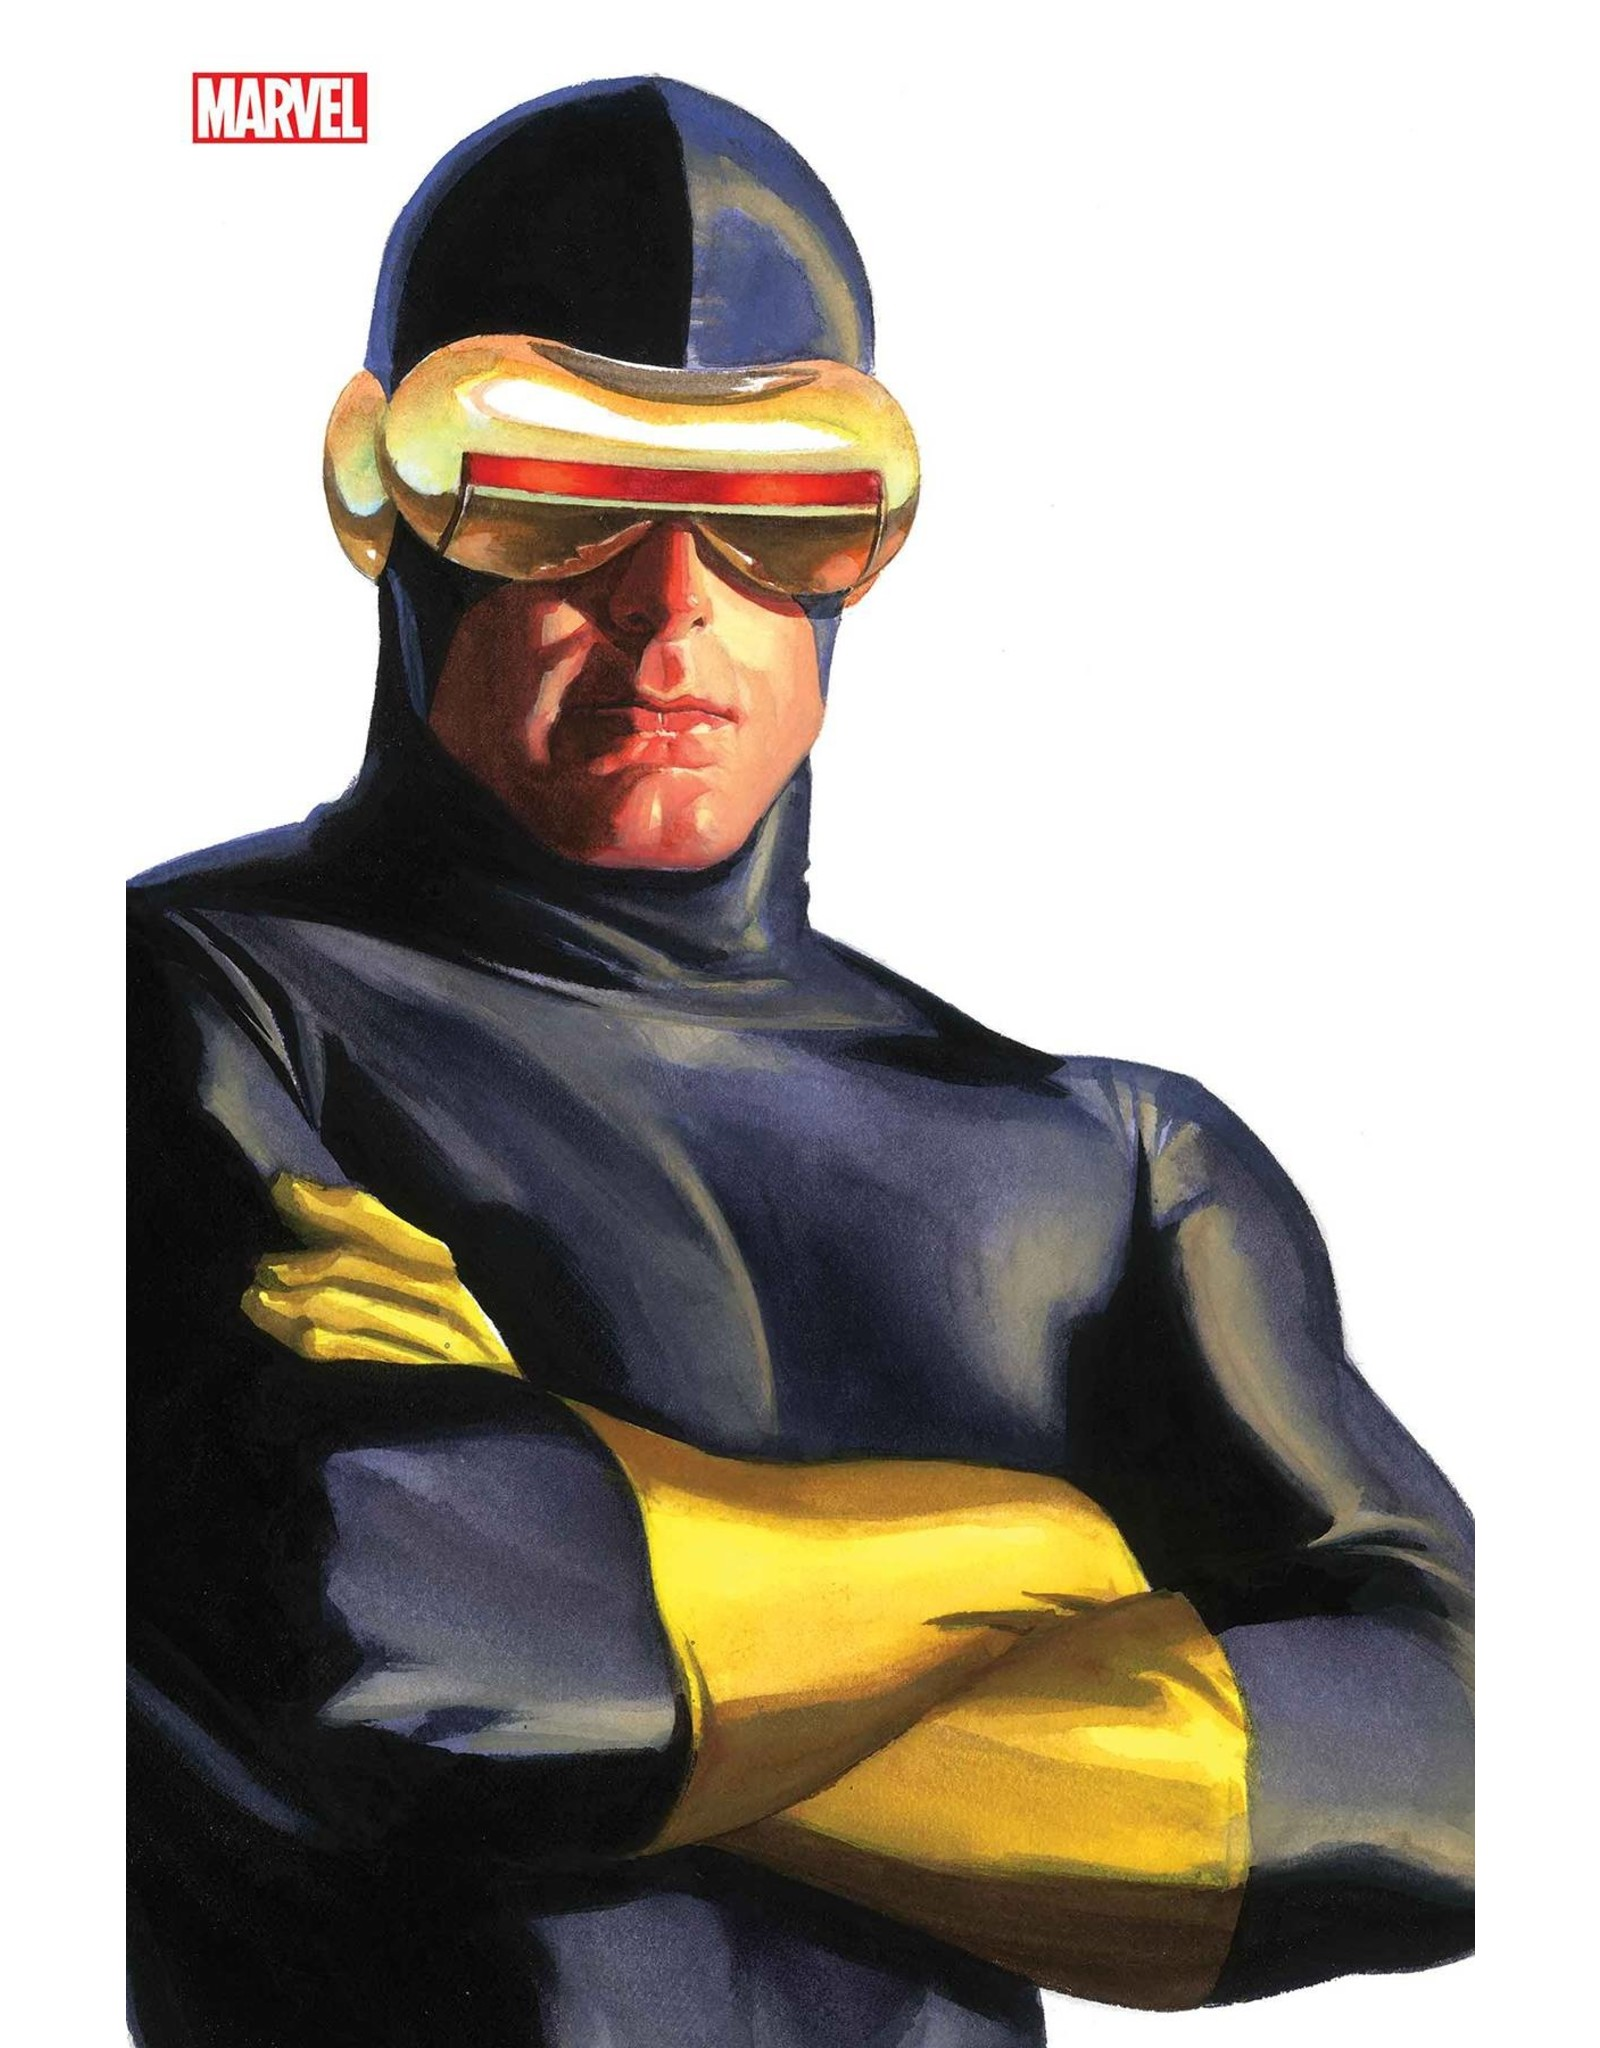 MARVEL COMICS X-MEN #13 ALEX ROSS CYCLOPS TIMELESS VAR XOS